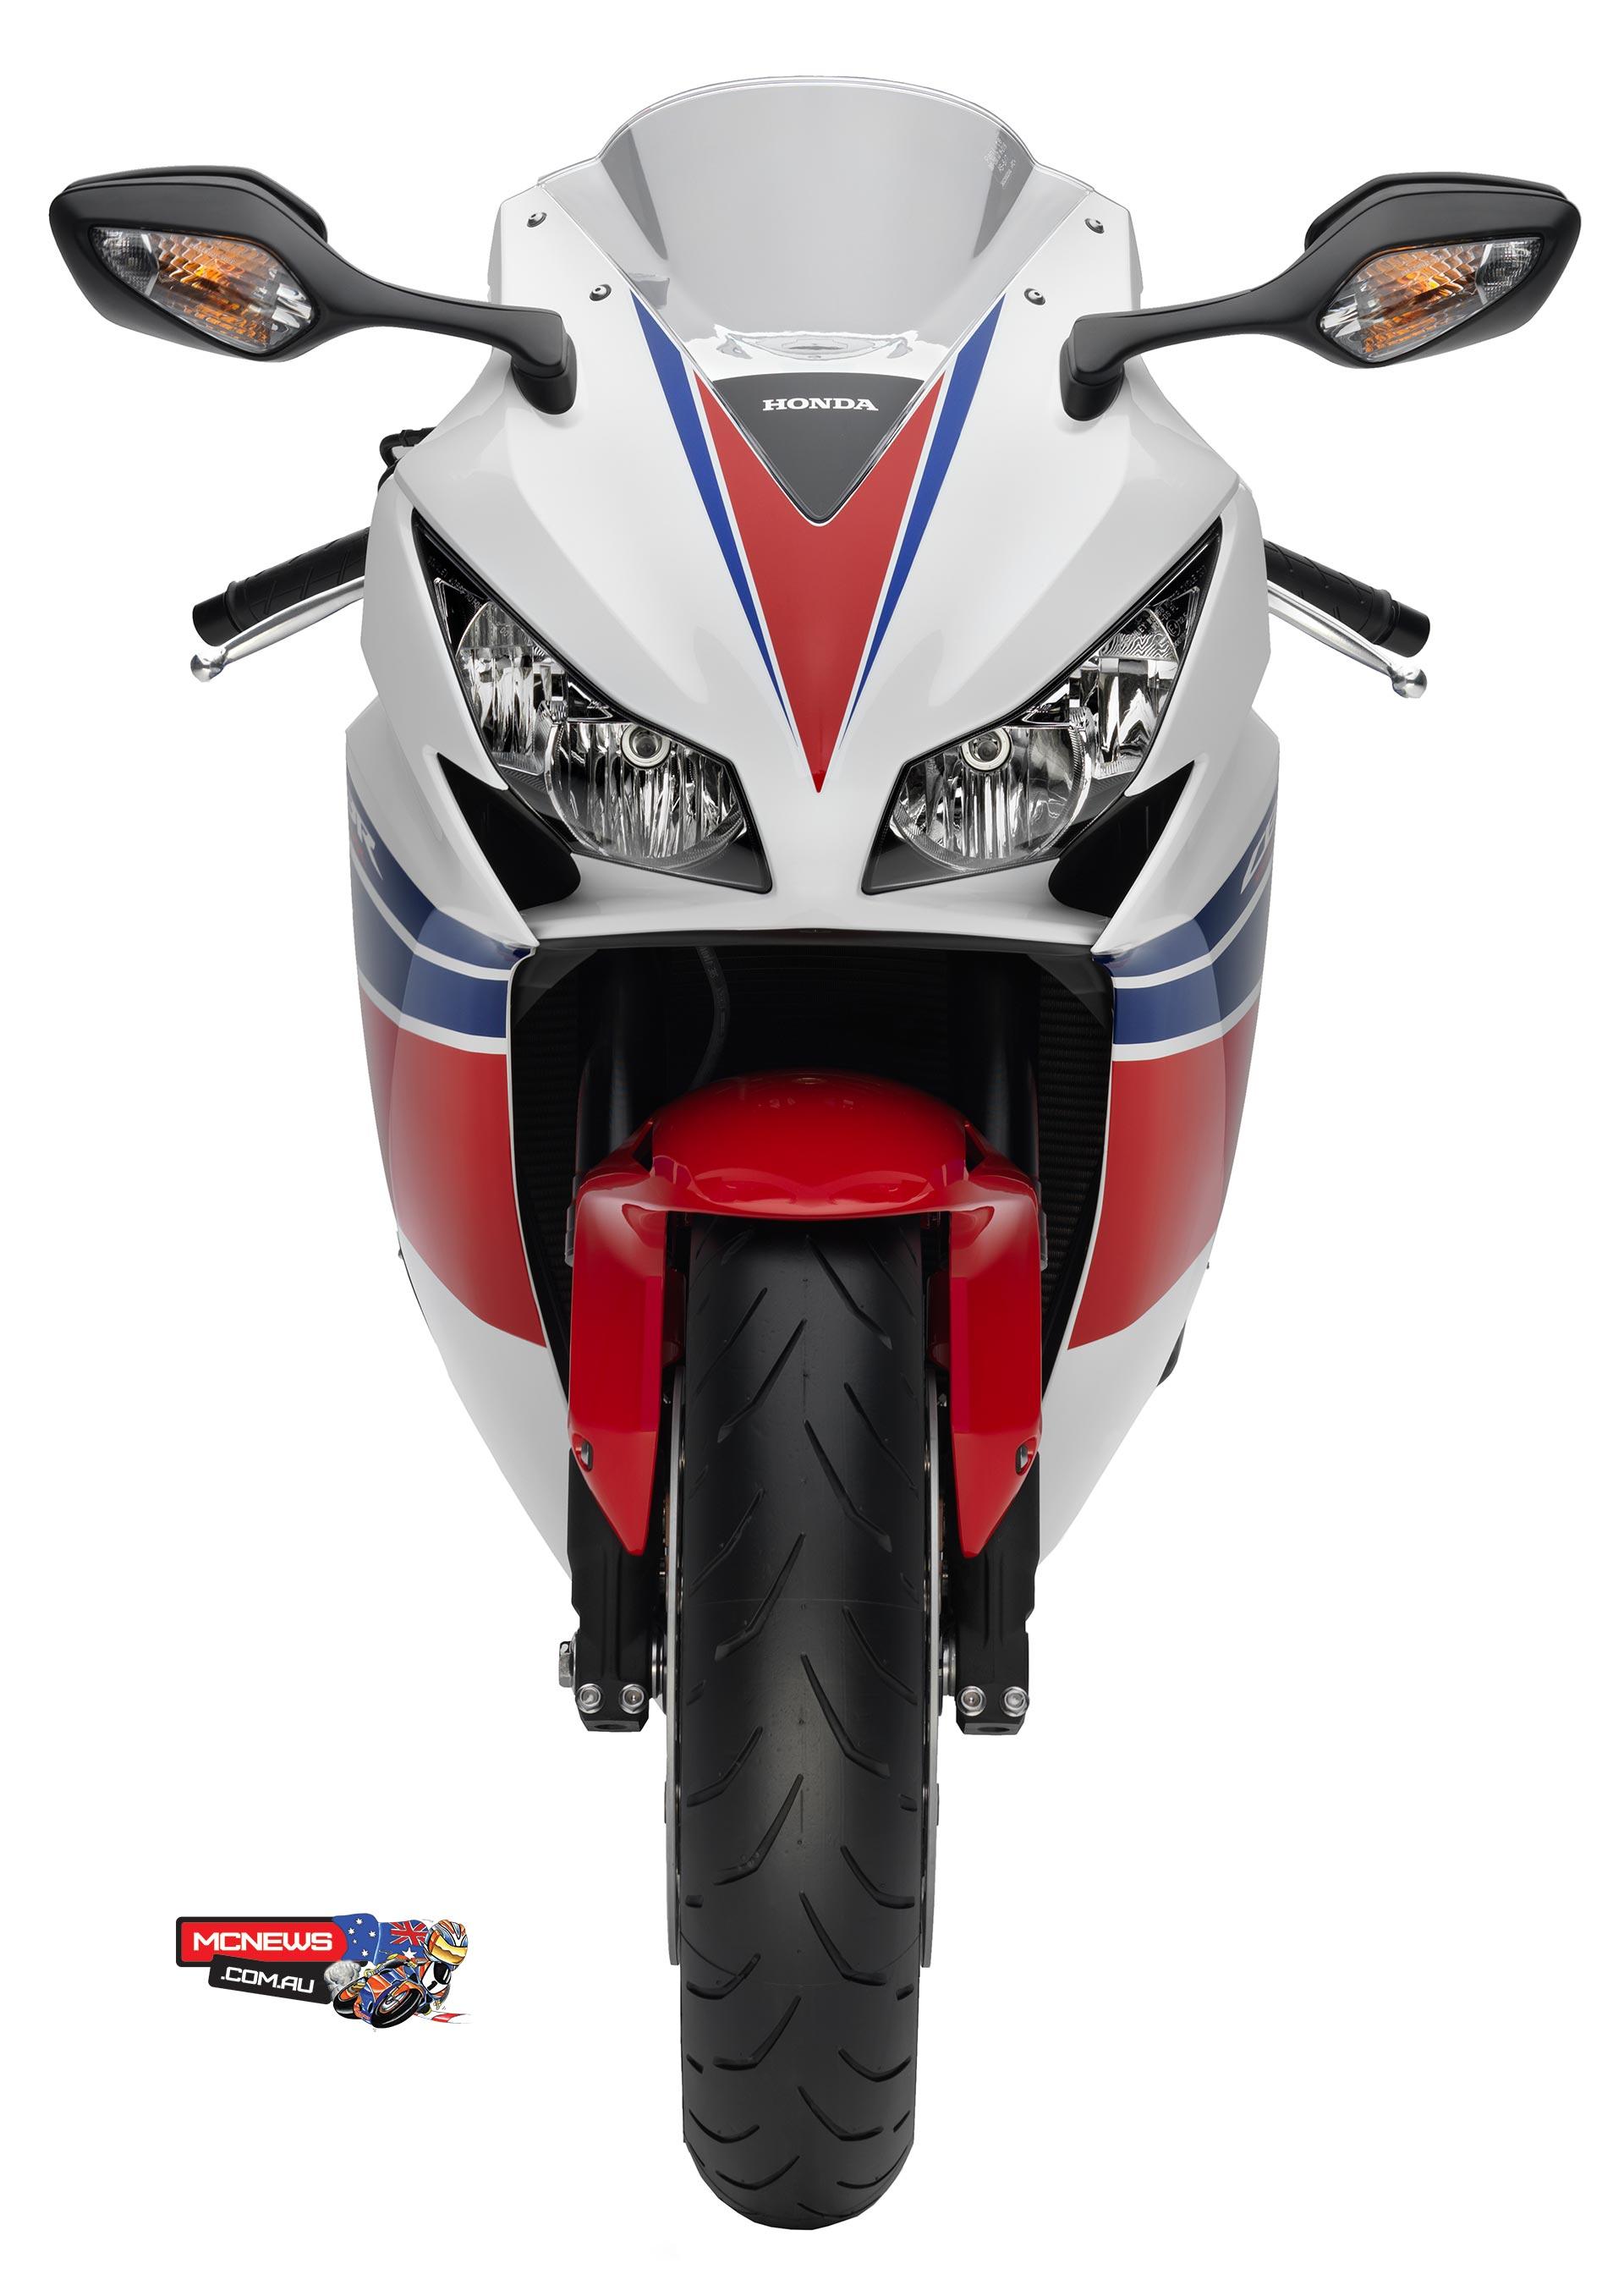 2015 Honda CBR1000RR Fireblade